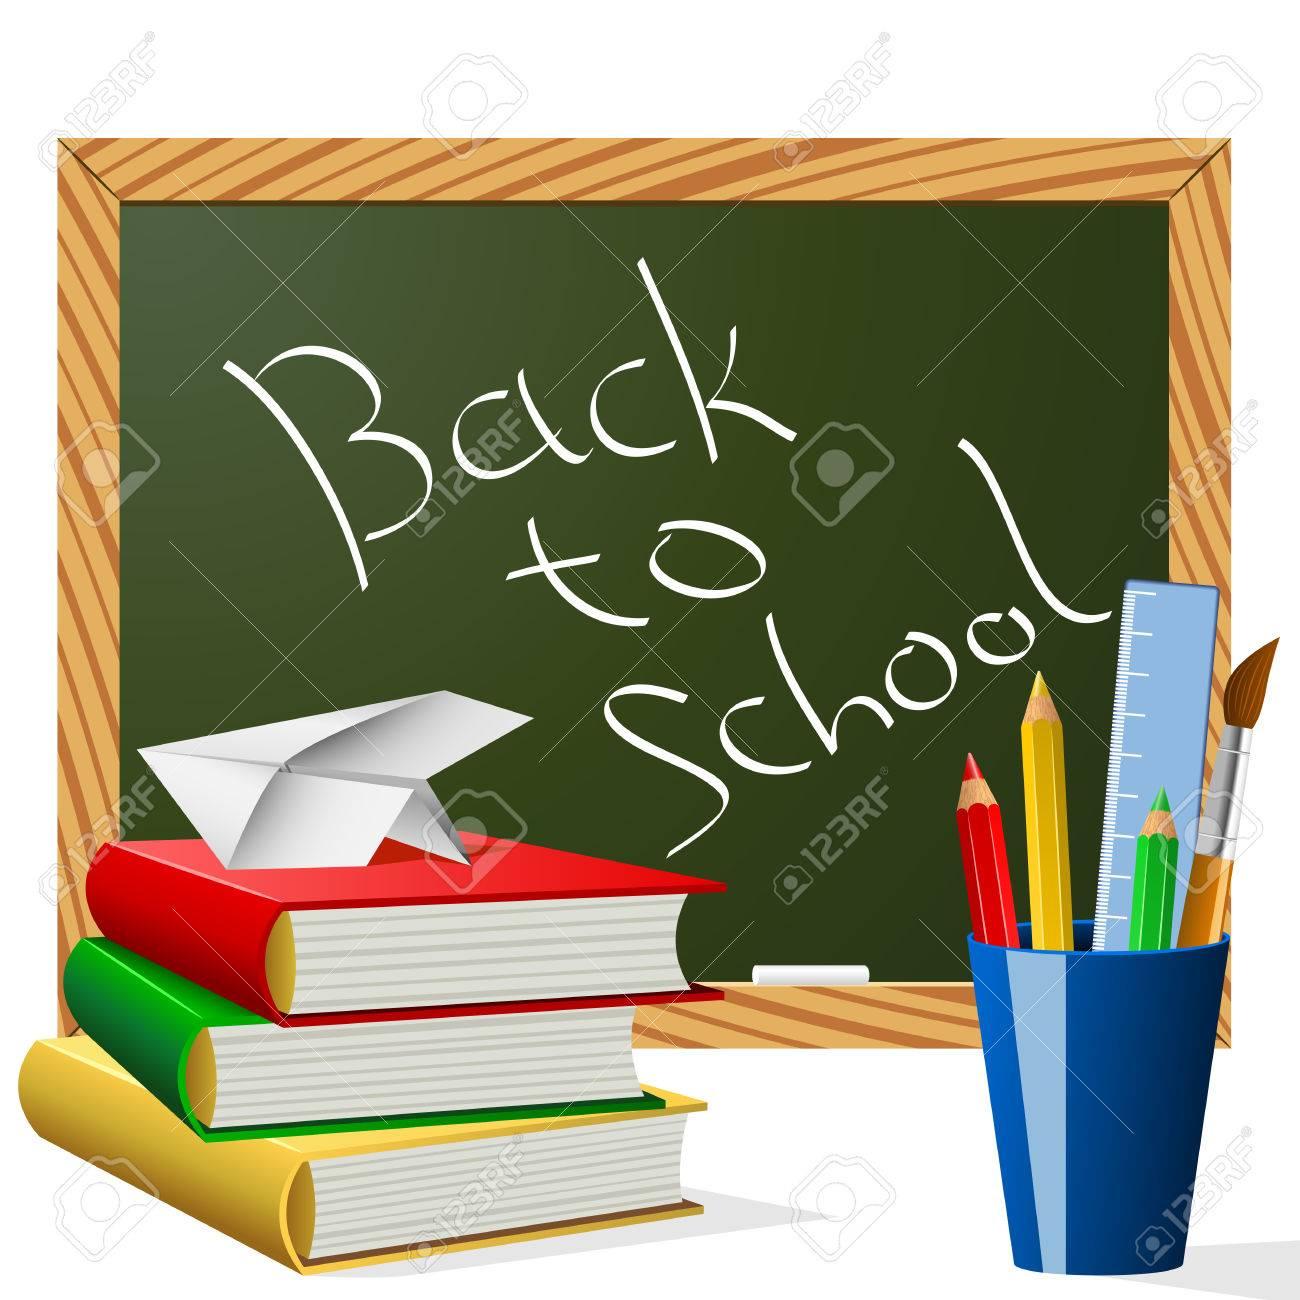 School year beginning concept illustration. Stock Vector - 7510197